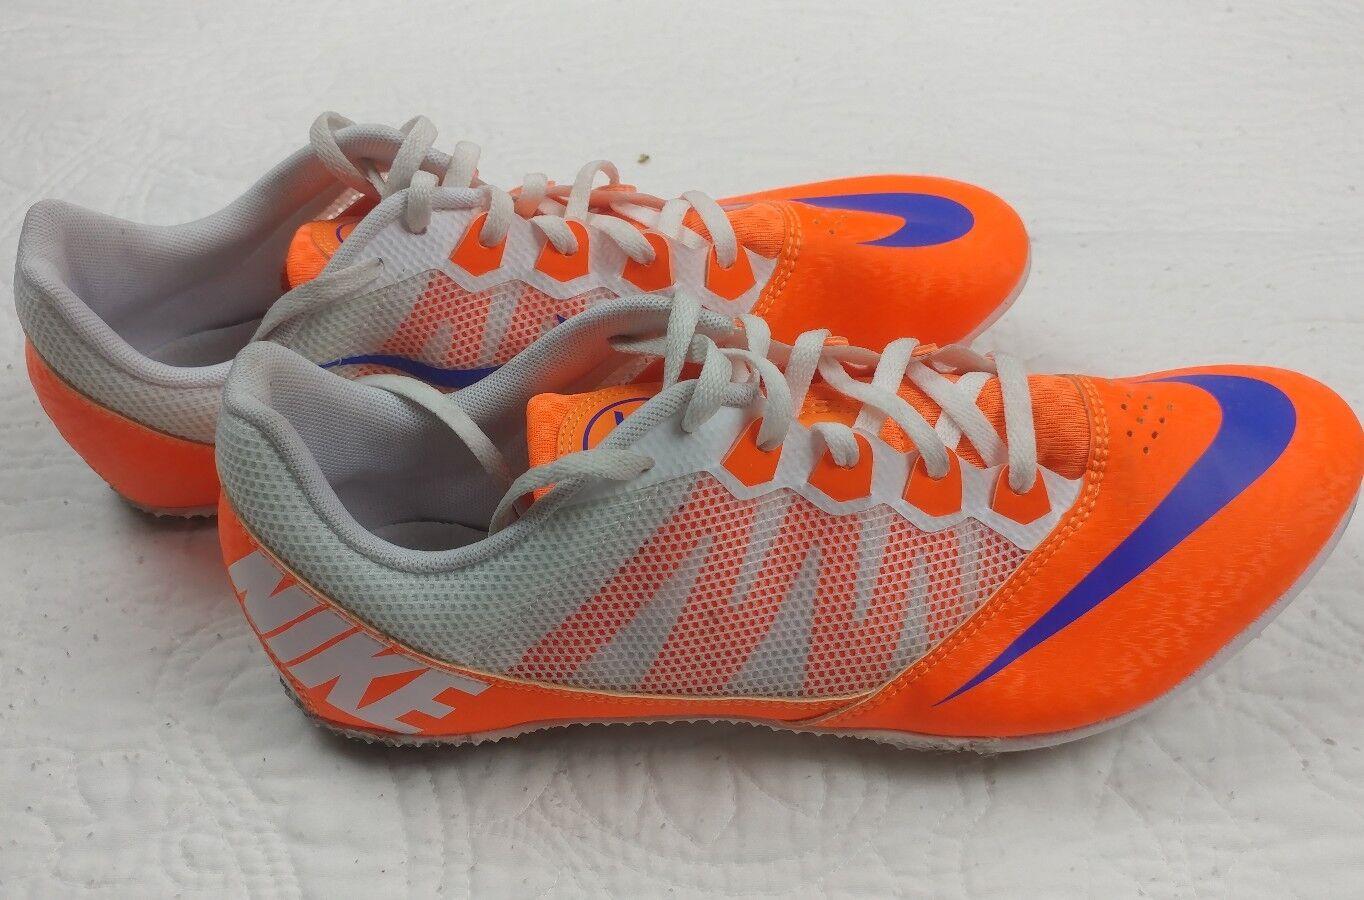 Nike Men's Sprint Track Spikes size 11.5 Style 616313-841  Seasonal clearance sale